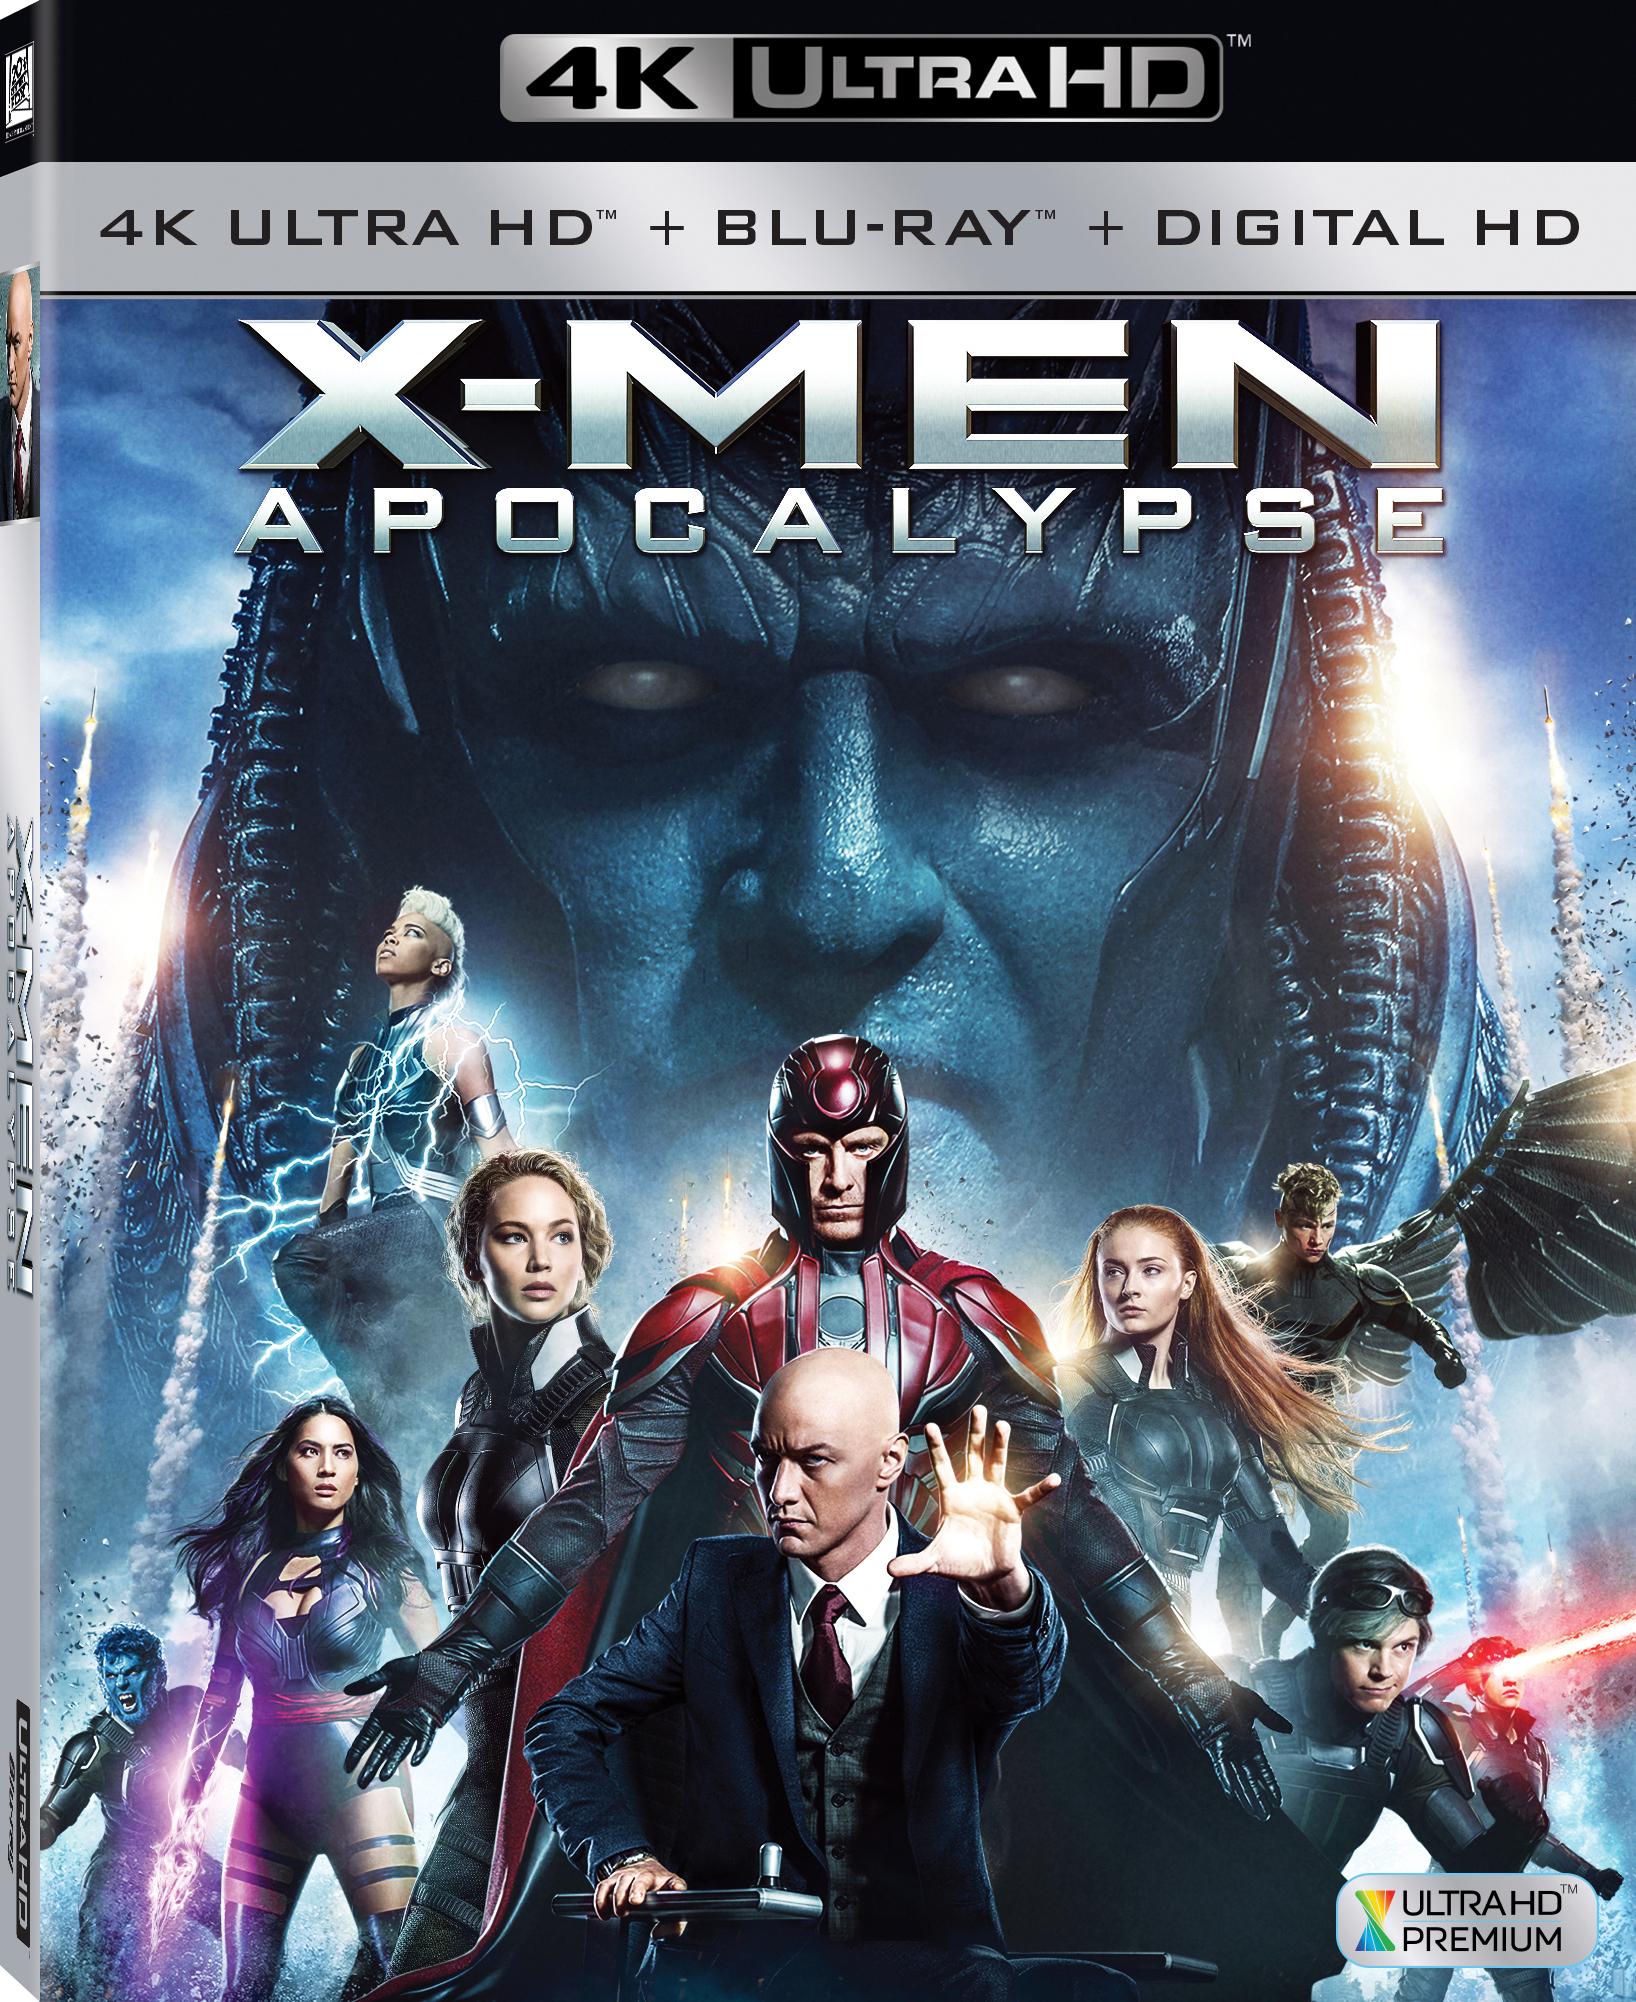 X-Men: Apocalypse (2016) 4K Ultra HD Blu-ray